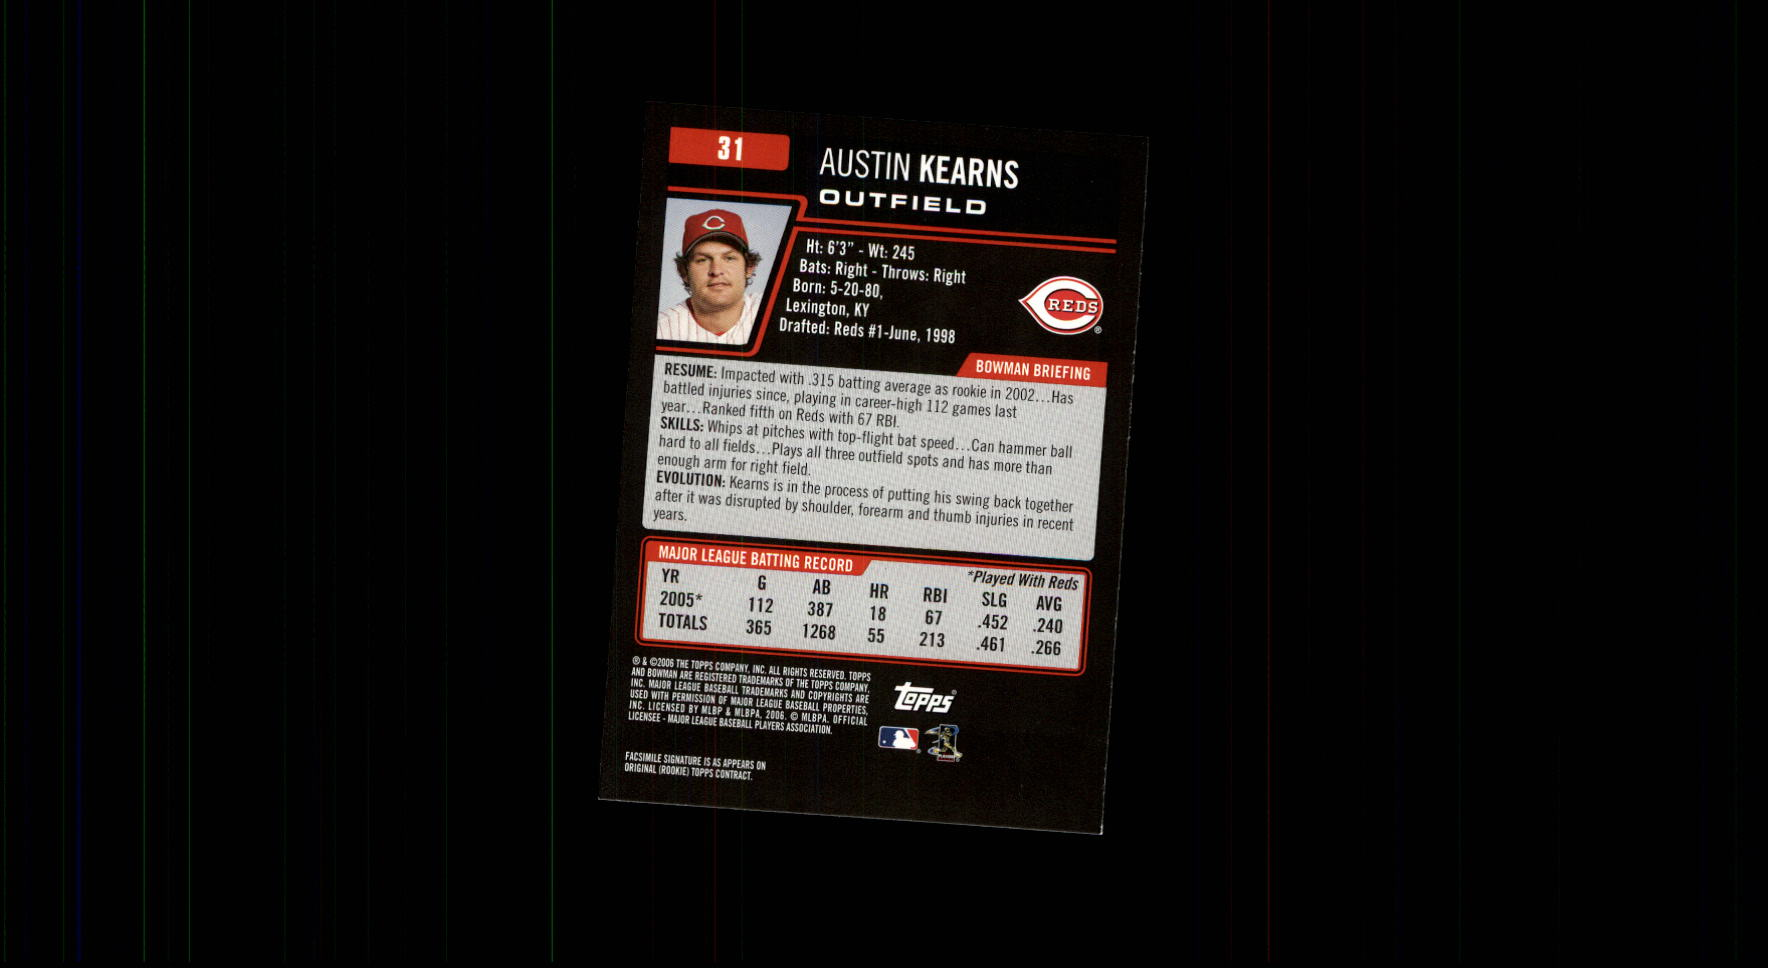 2006 Bowman #31 Austin Kearns back image